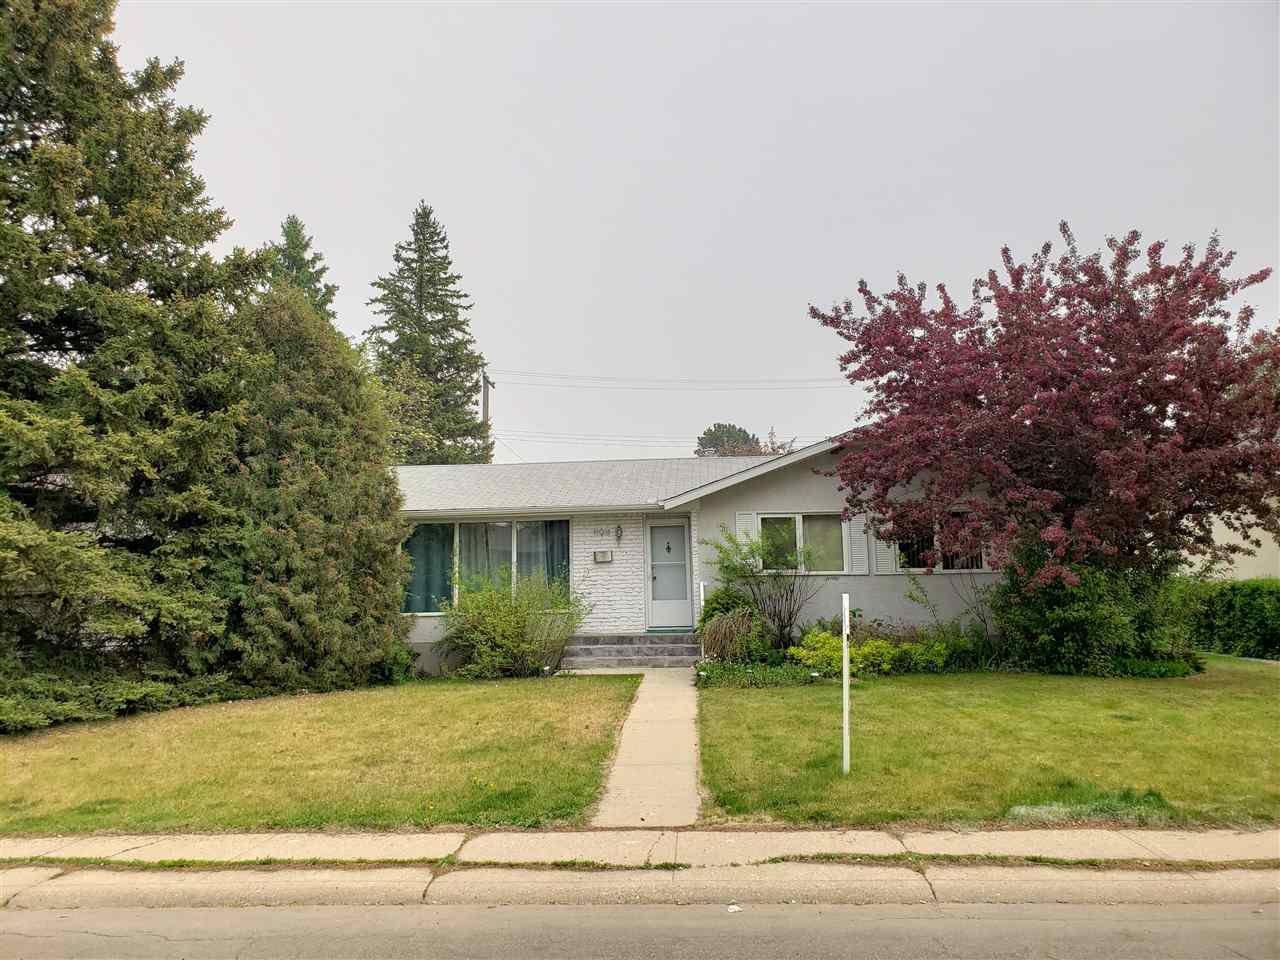 Main Photo: 11911 41A Avenue in Edmonton: Zone 16 House for sale : MLS®# E4151748